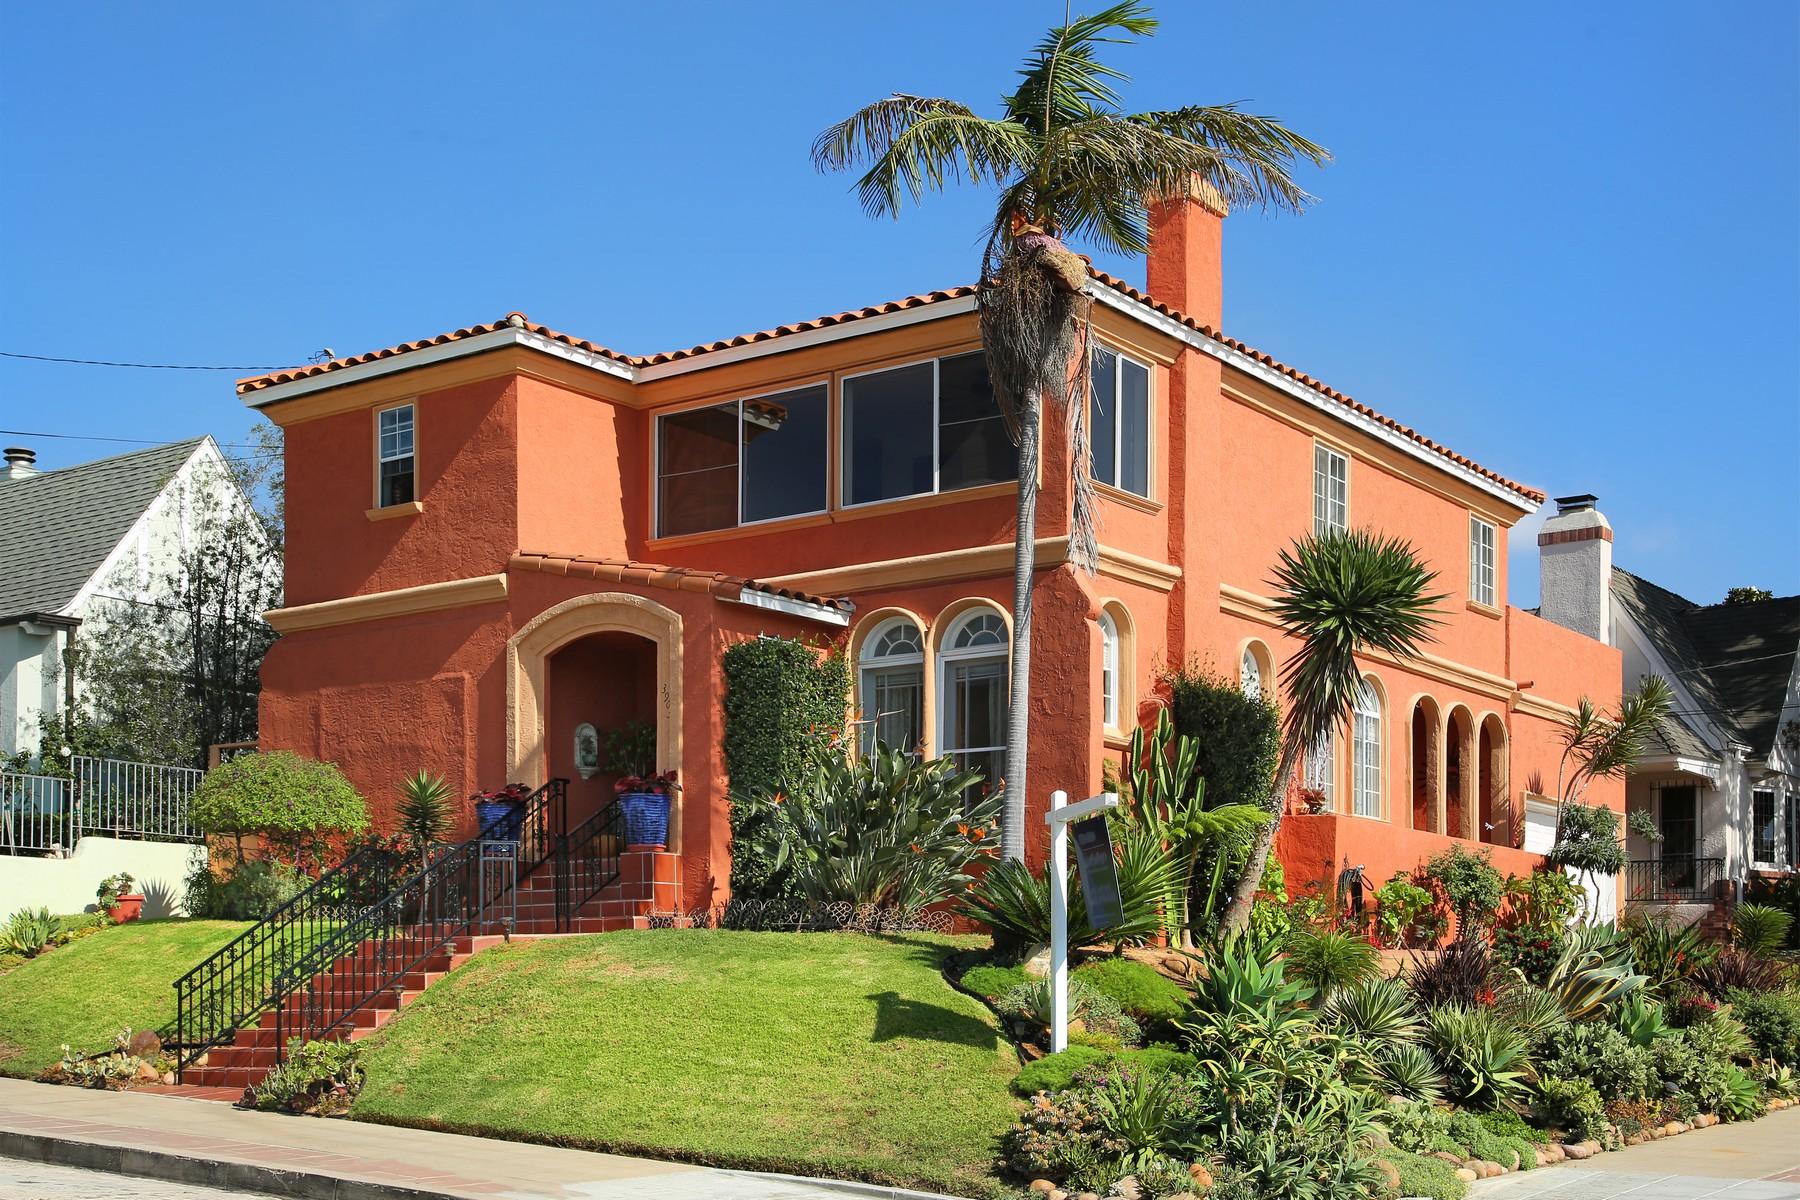 Imóvel para venda San Diego